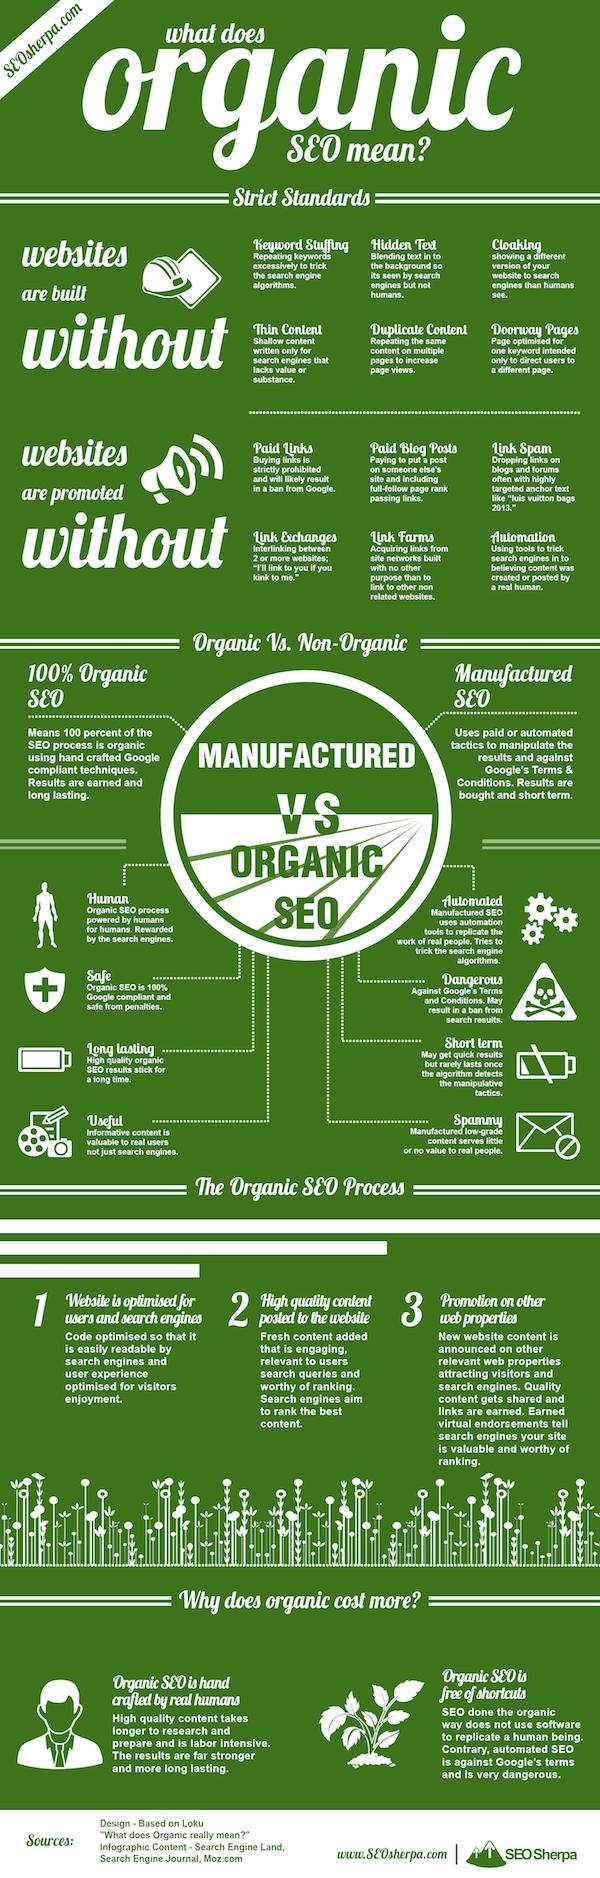 The Organic SEO Process [INFOGRAPHIC]